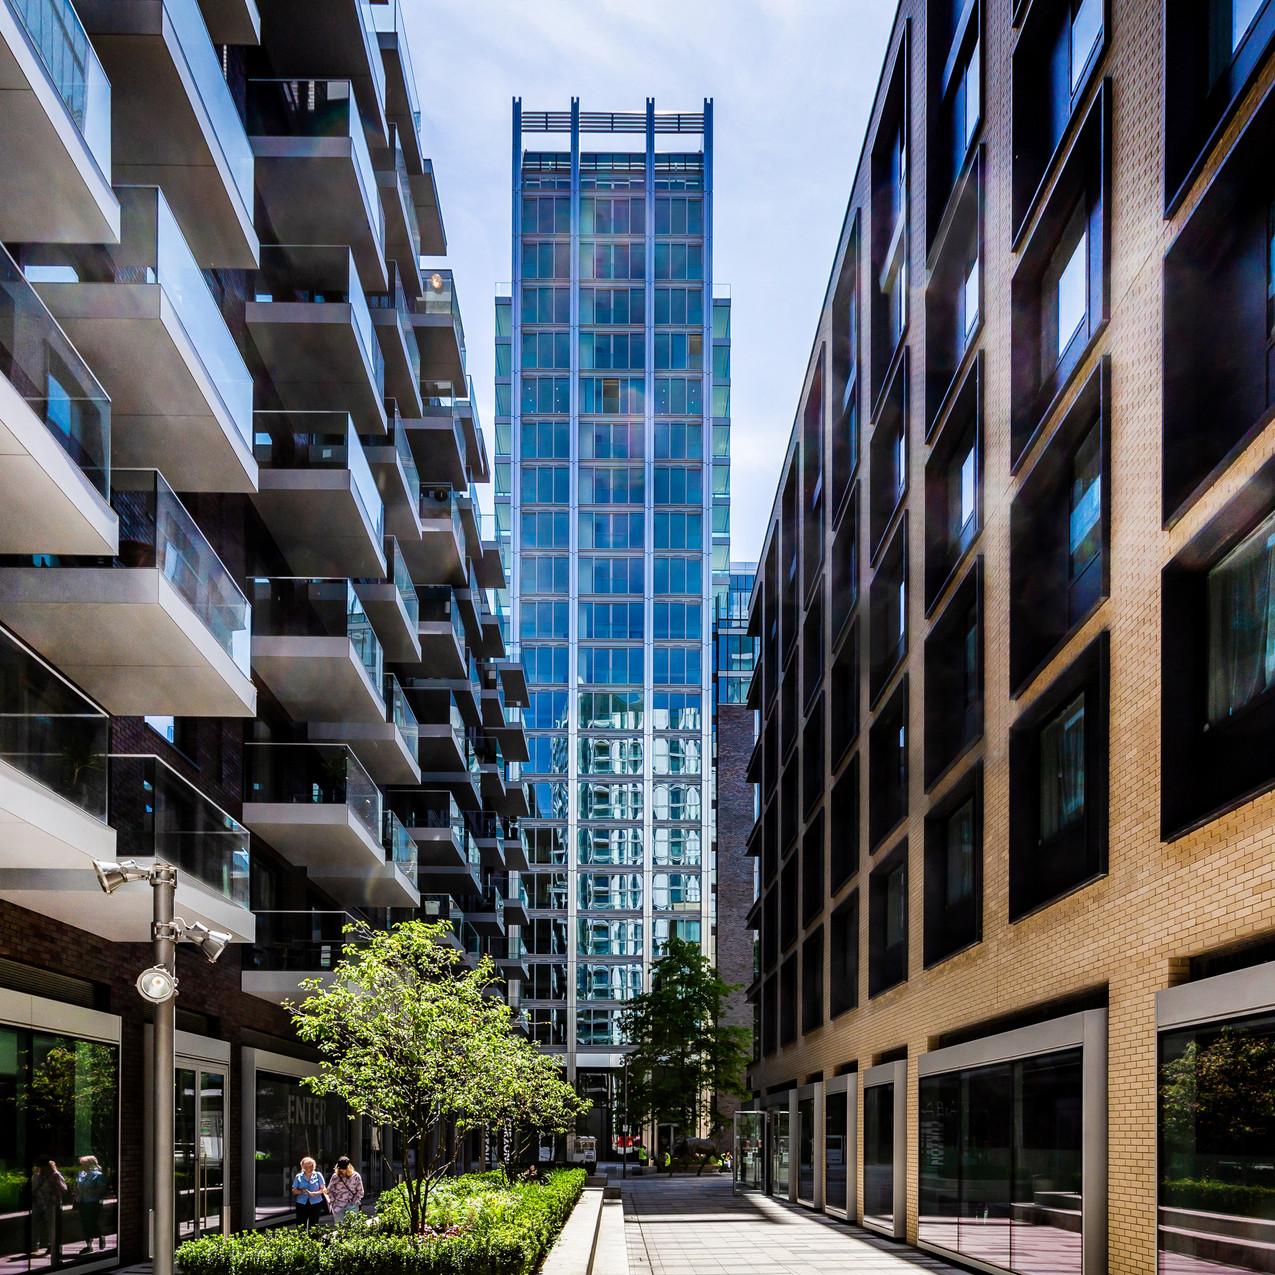 Building, Sky Scrapper, Whitechapel, London